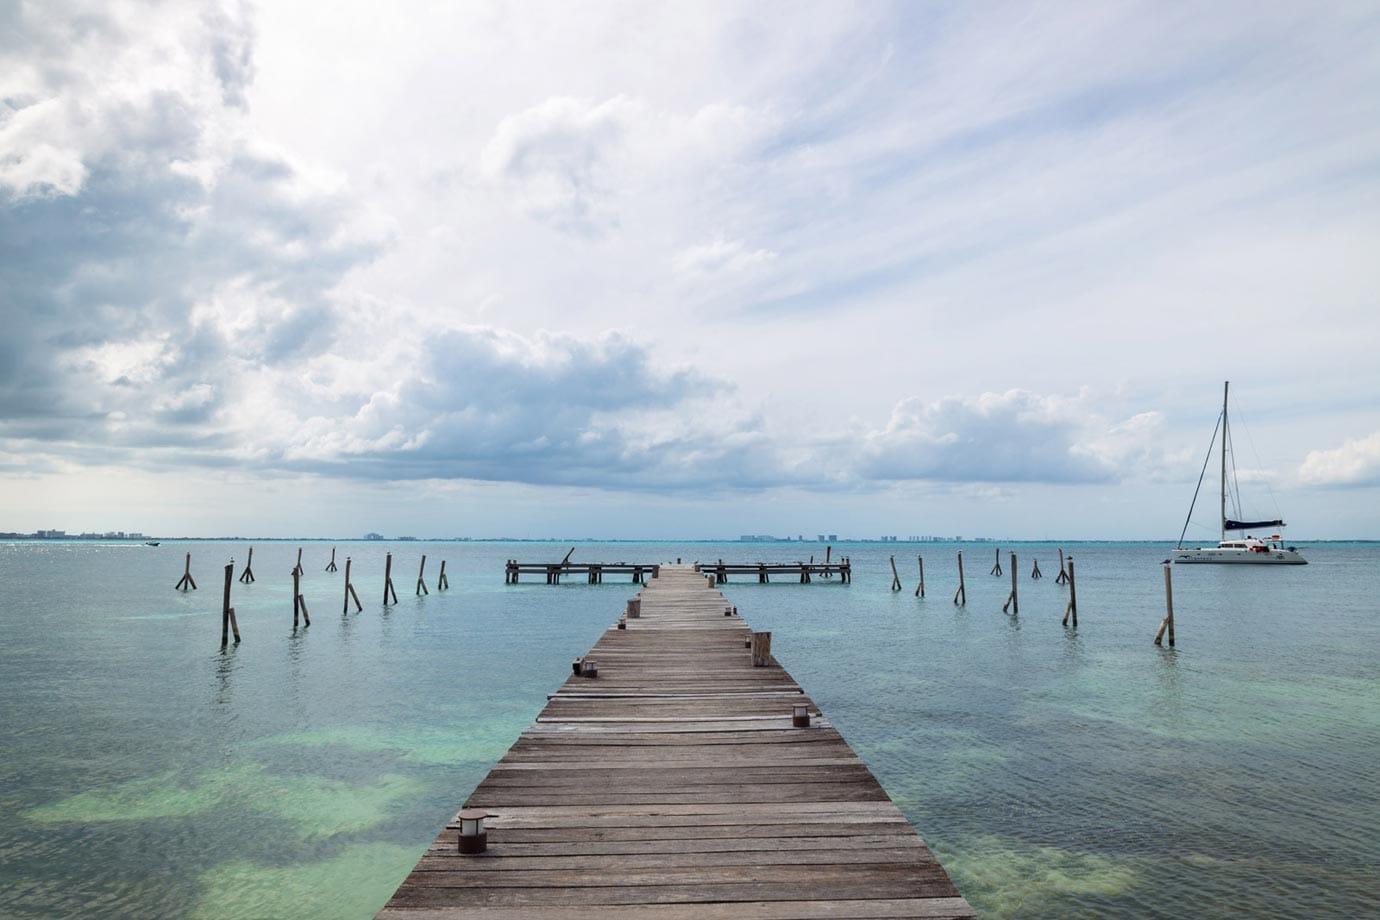 Pier at Isla Mujares, Mexico